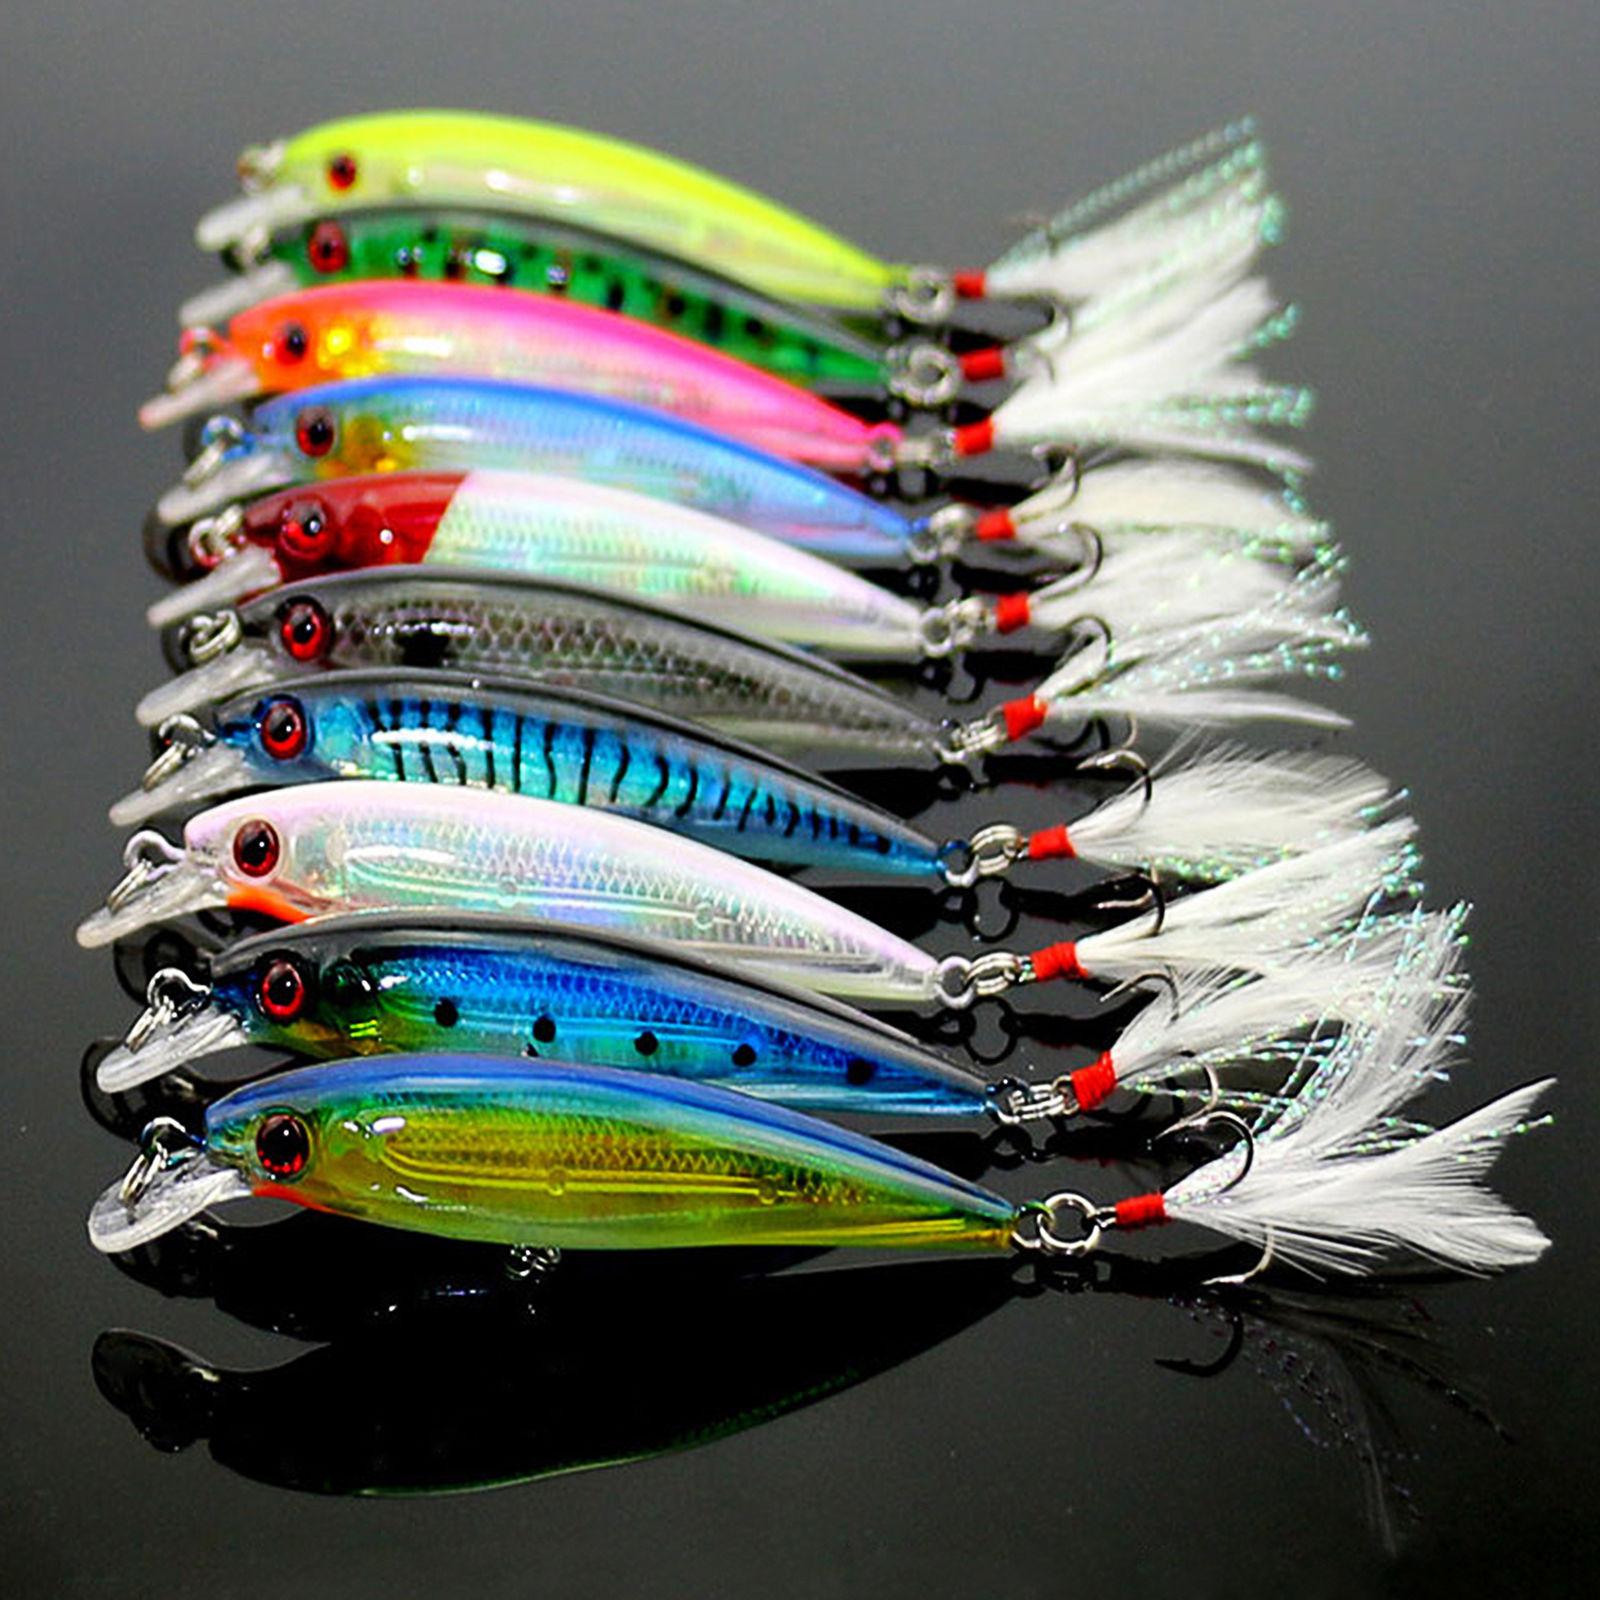 10pcs Fishing Lures Crankbaits Hook Minnow Baits Tackle Crank Fishing Kit in Fishing Lures from Sports Entertainment